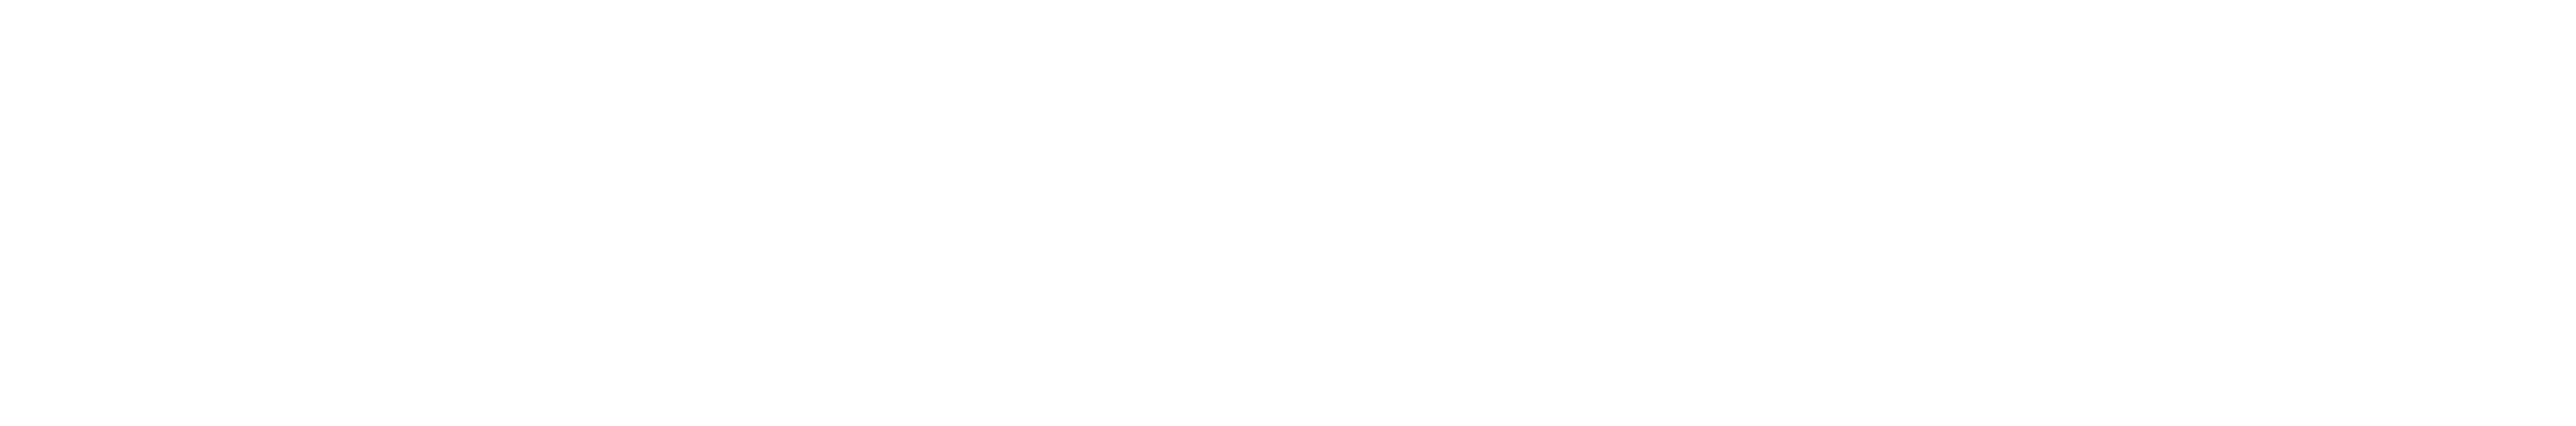 Peclers+ logo